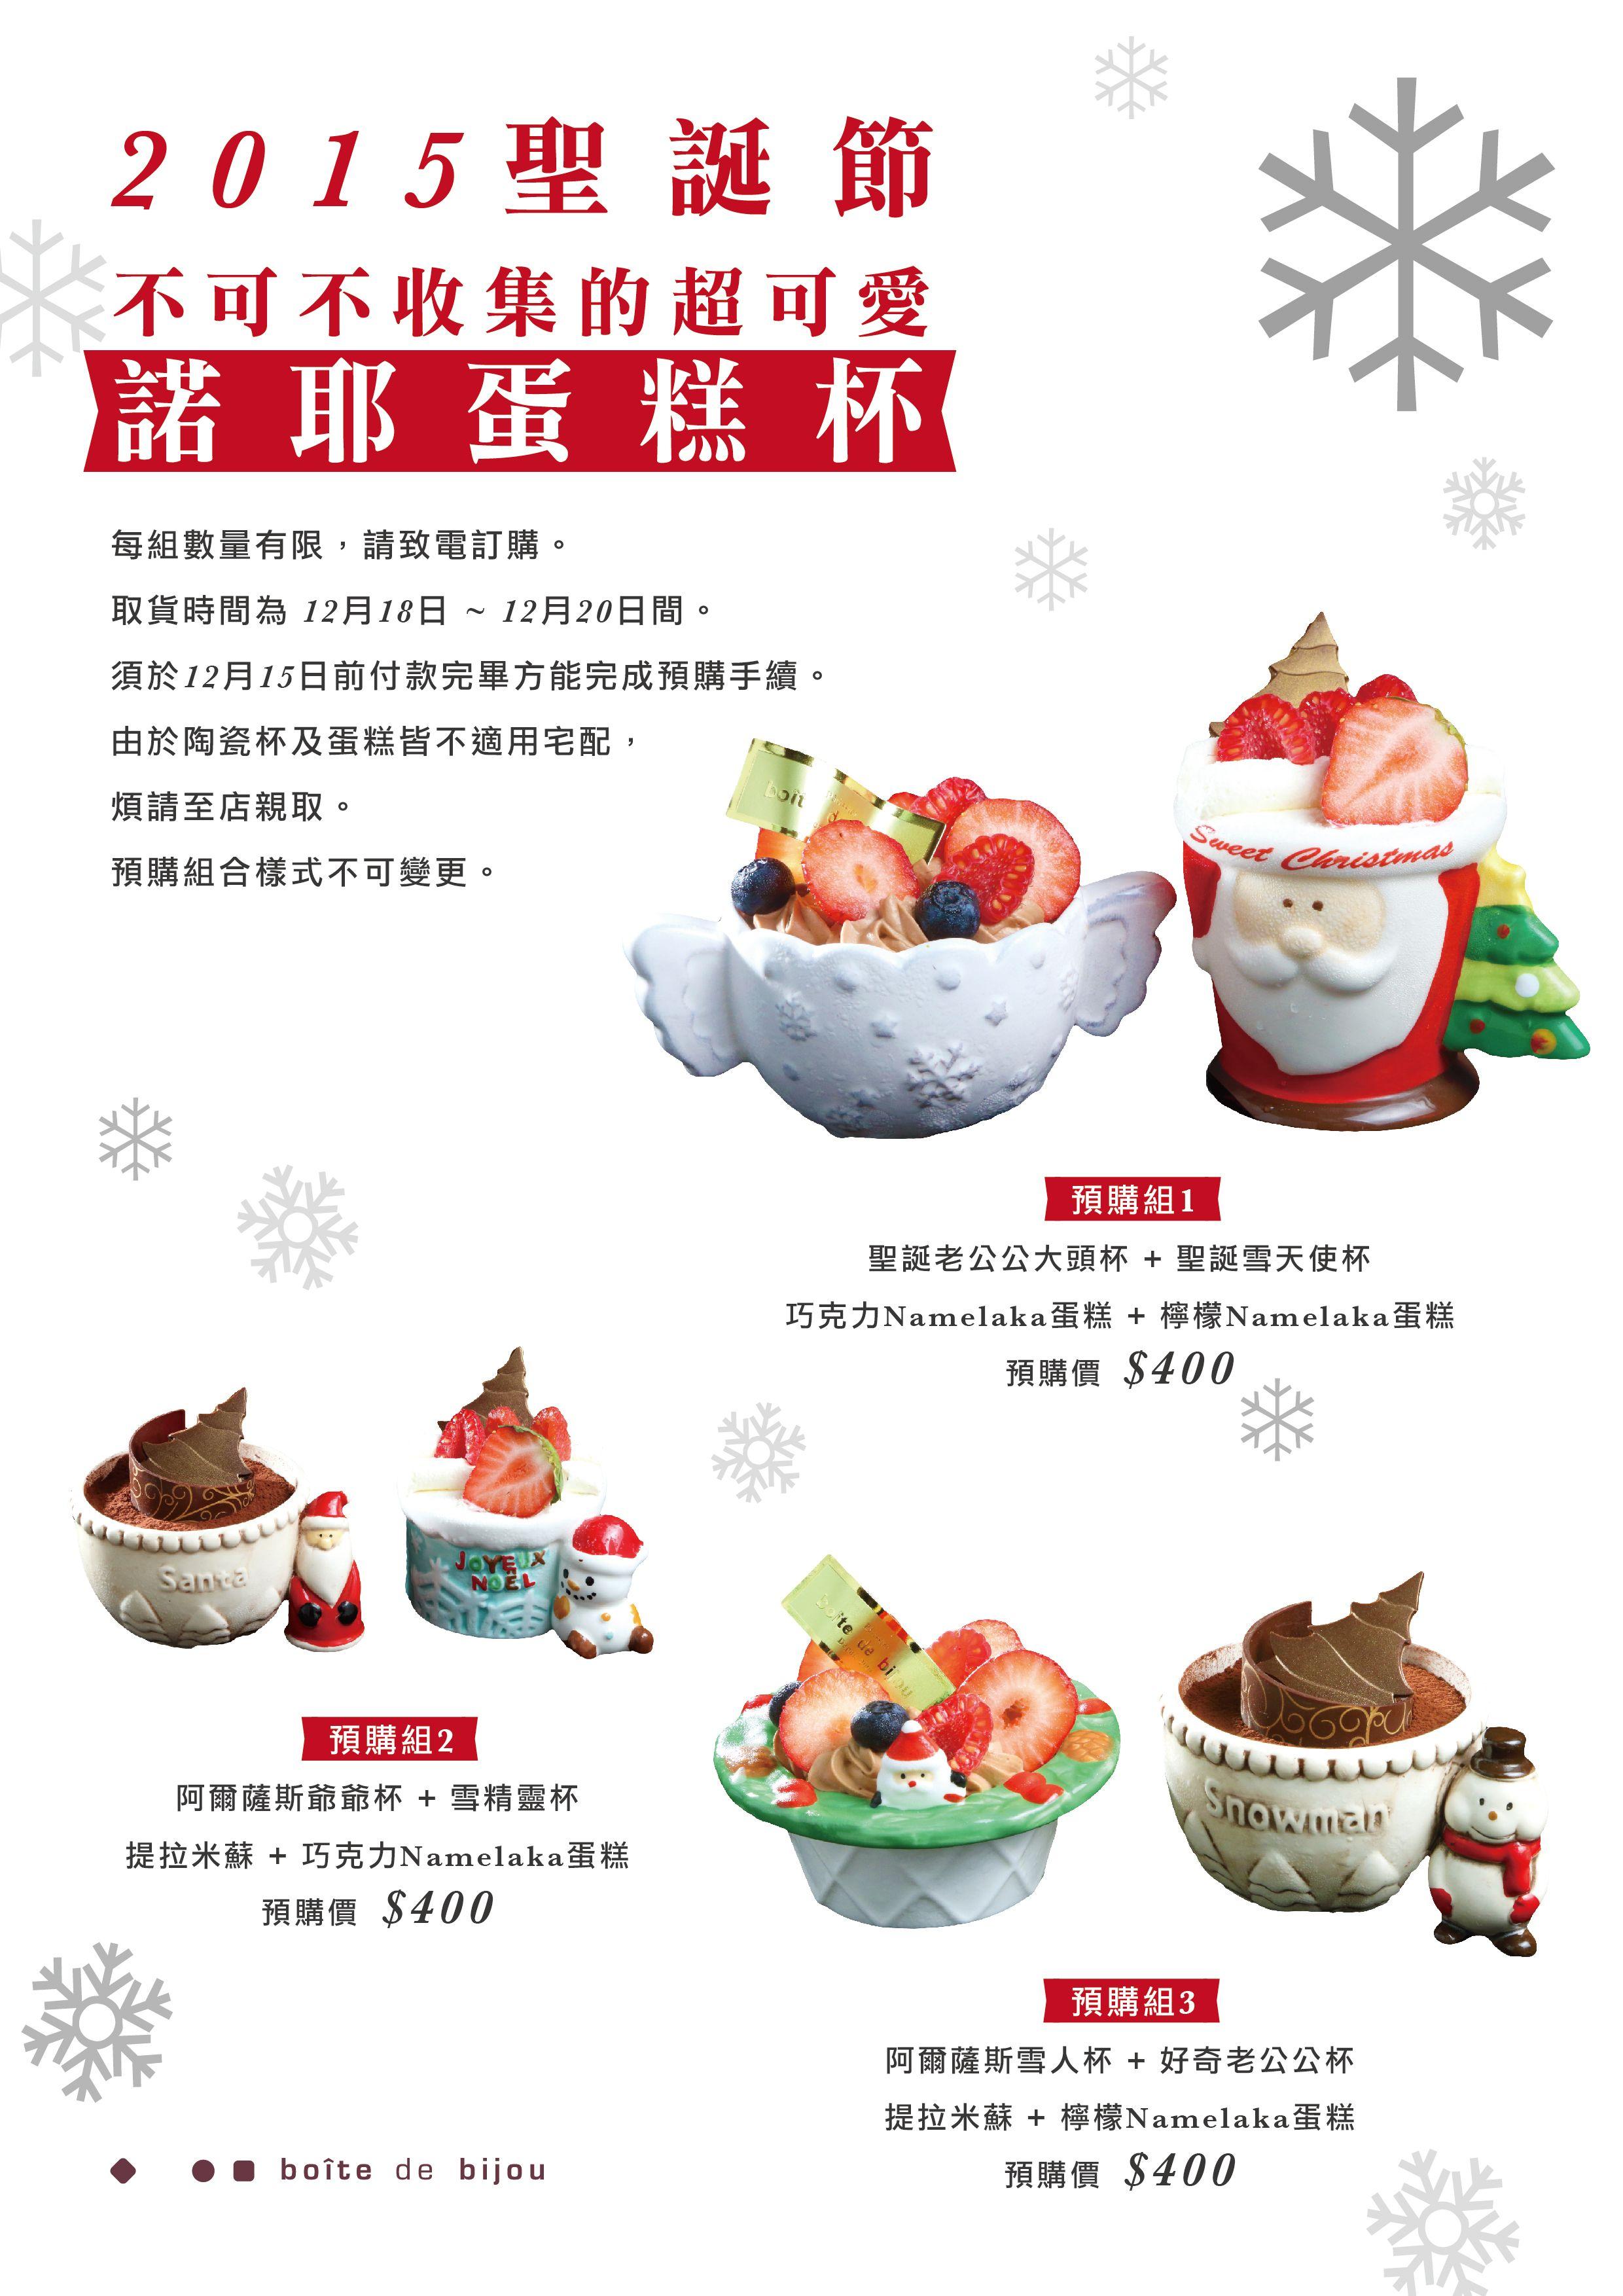 2015聖誕節 不可不收集的超可愛 諾耶蛋糕杯 Boitedebijou Christmas Printable Cup Cakes Cake 珠寶盒法式點心坊 聖誕節 諾耶蛋糕杯 甜點 立牌 Food And Drink Food Tableware